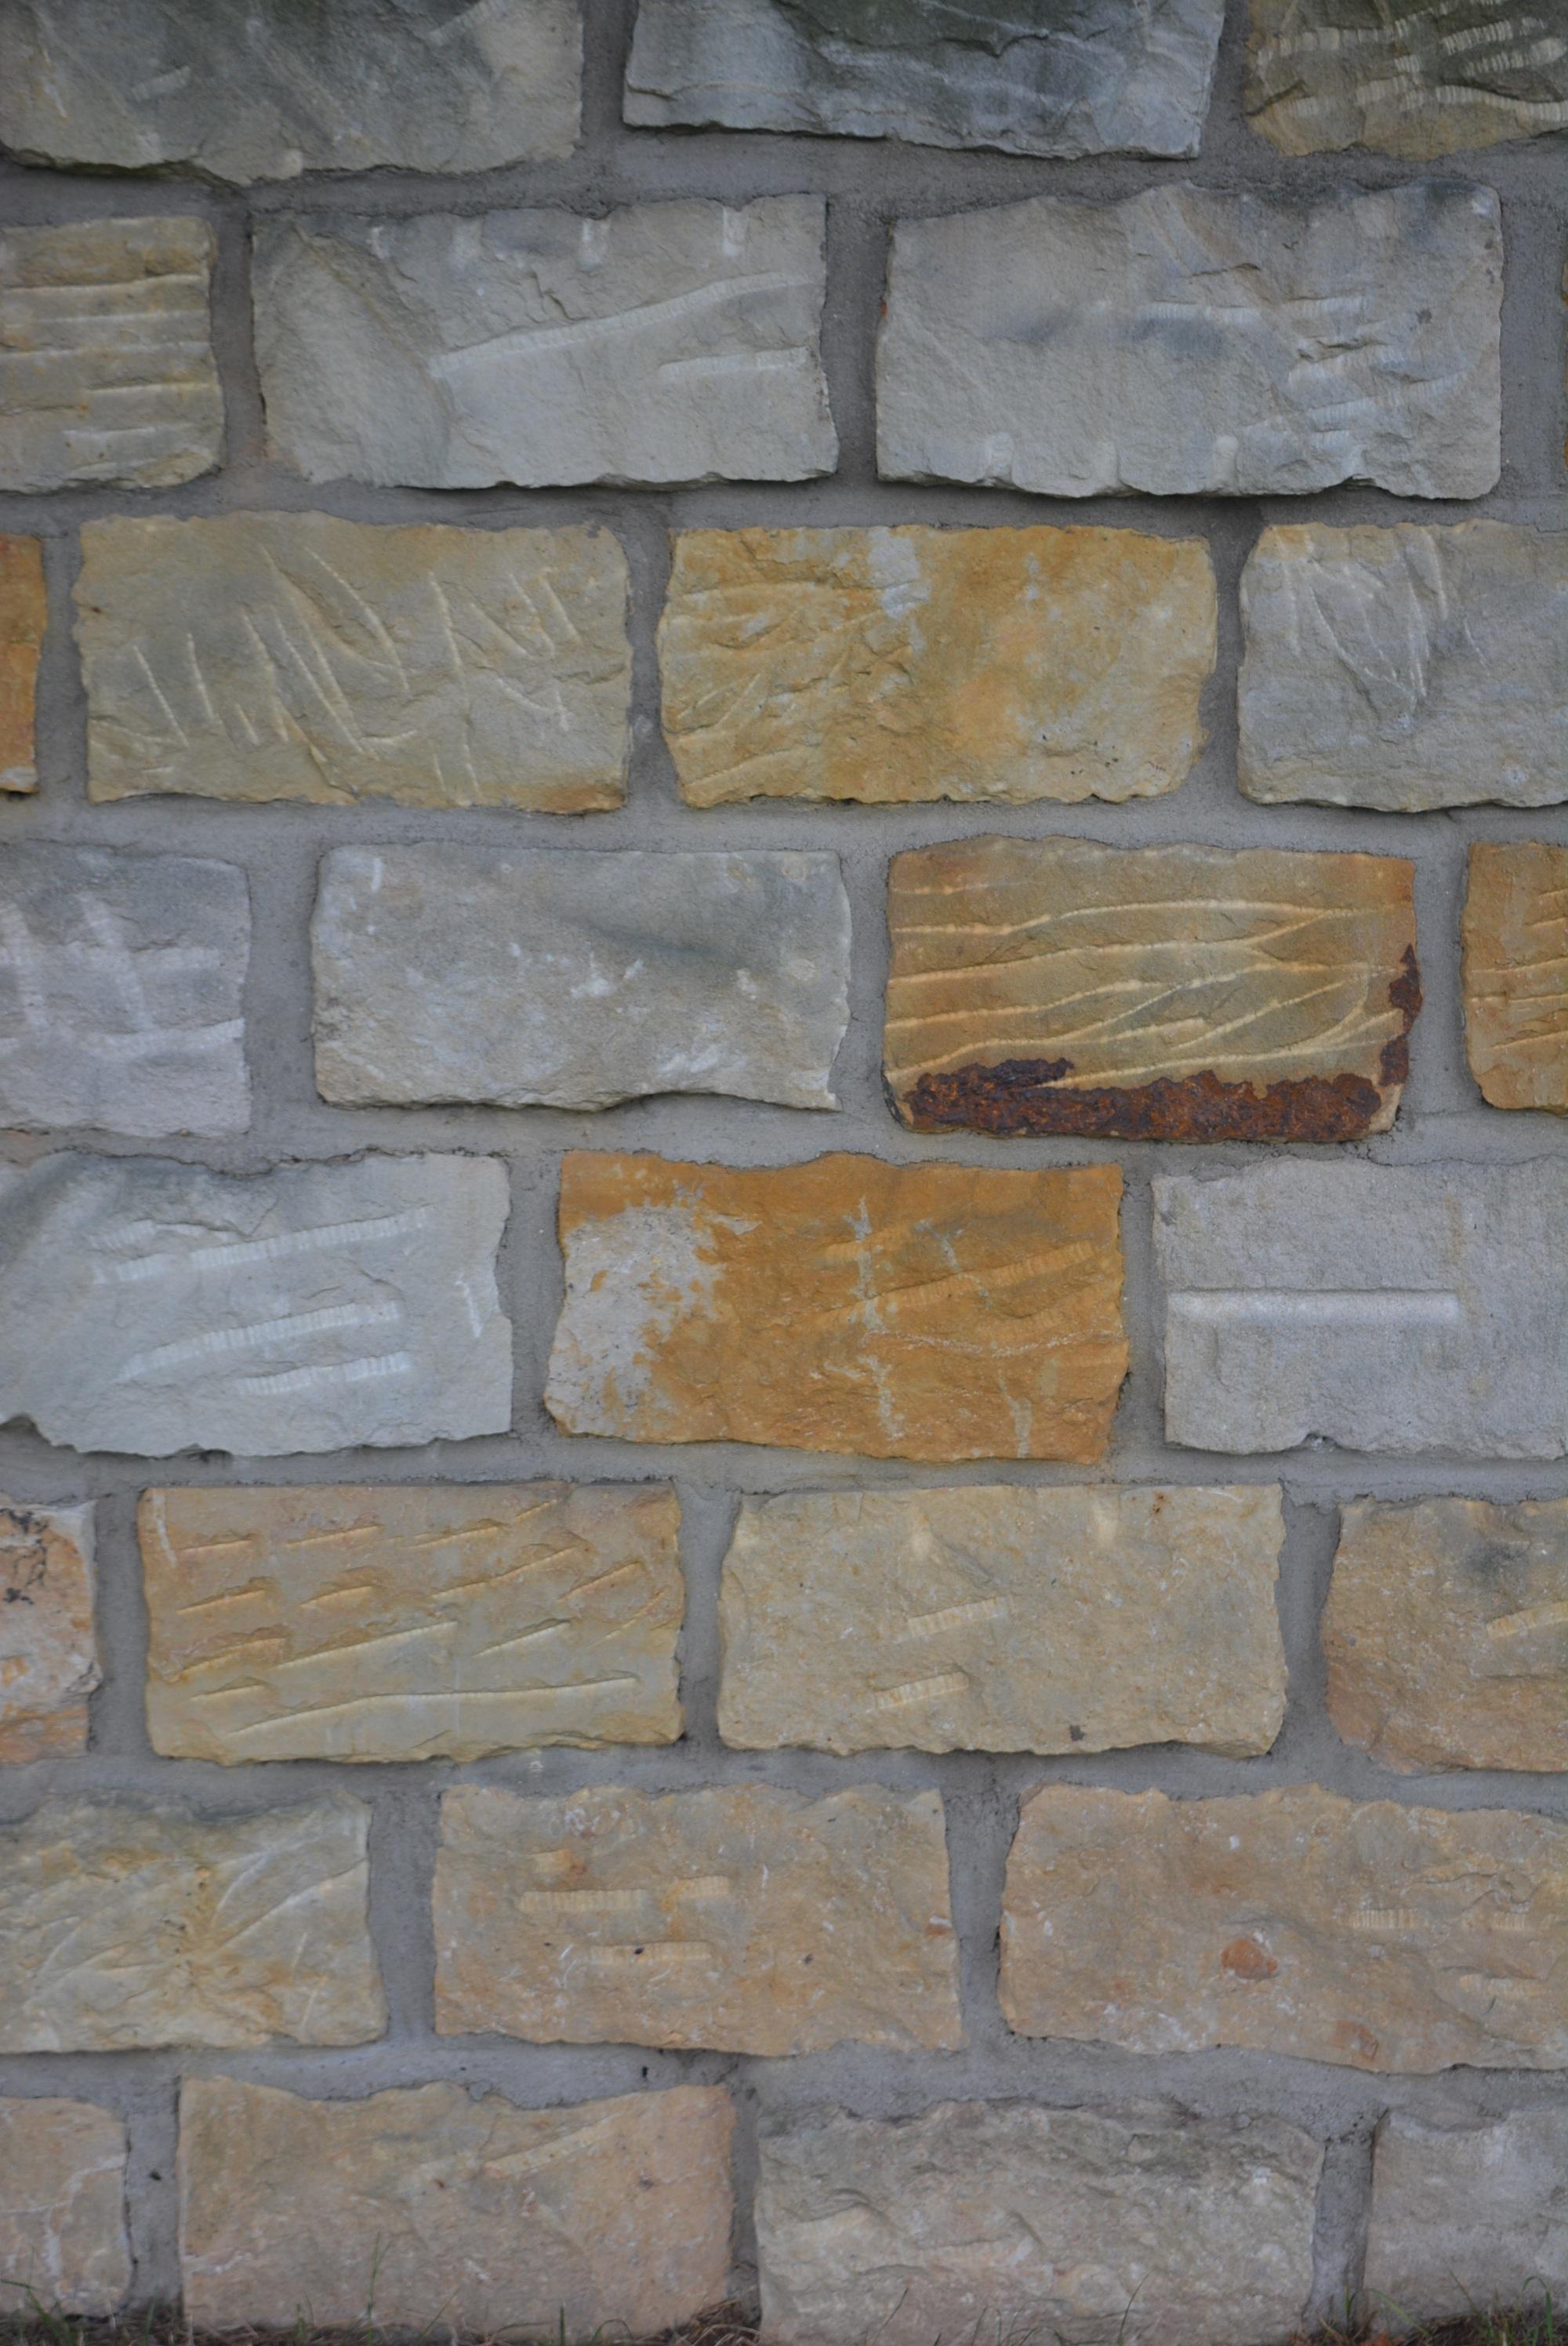 natural stone floor texture. Brilliant Floor Texture Floor Wall Stone Brick Material Stones Brickwork Natural  Flooring Chiseled Flagstone In Natural Stone Floor Texture